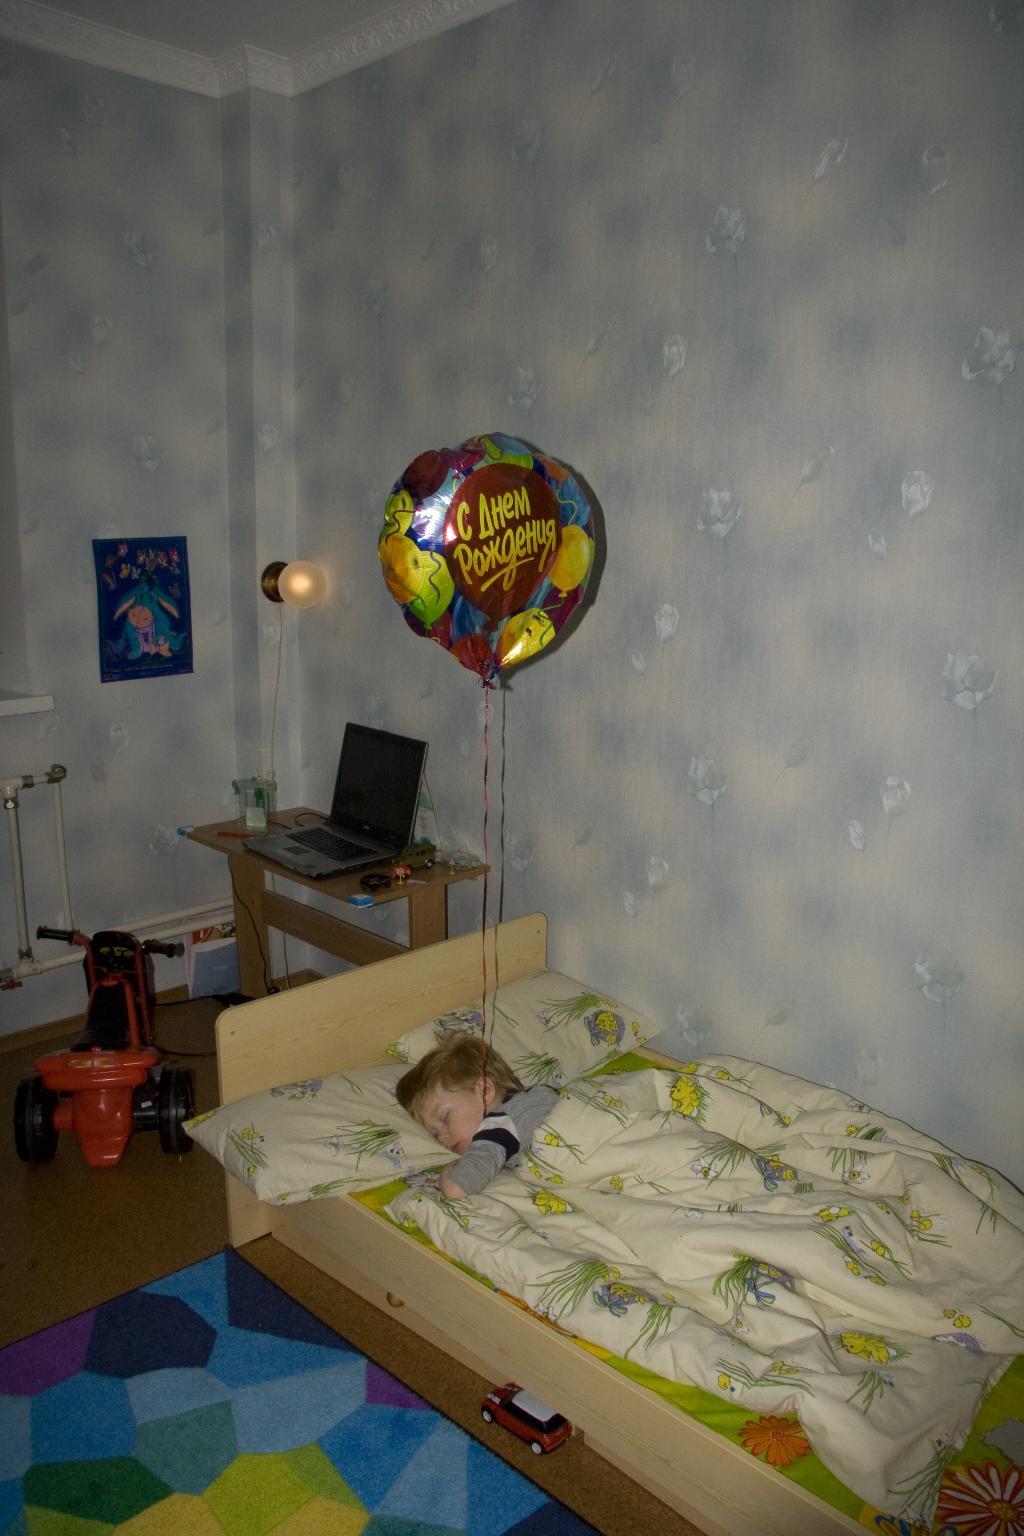 Шуршащий шарик. Спят усталые игрушки